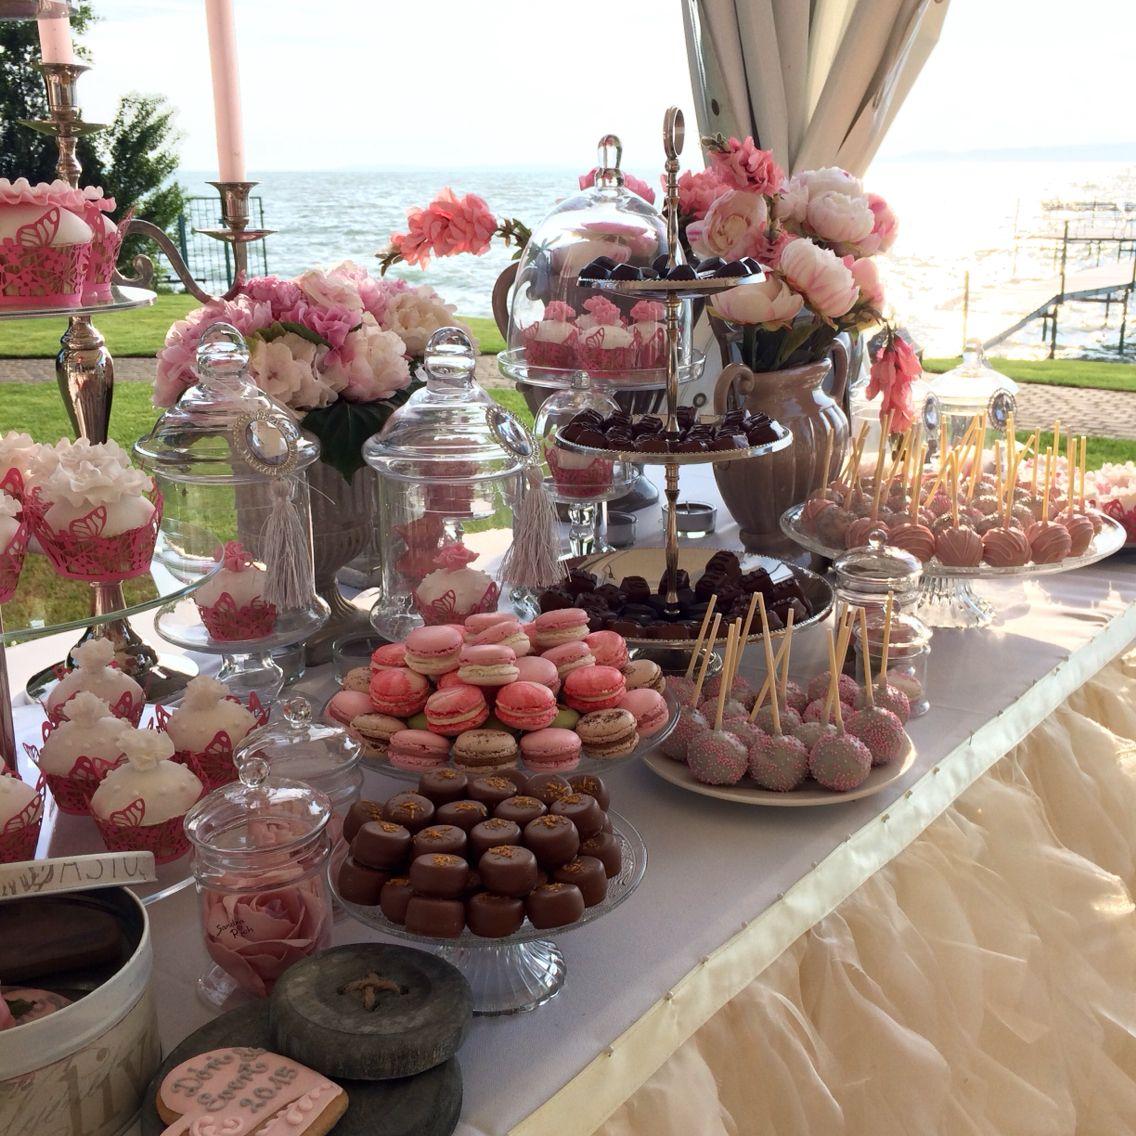 White Wedding Dessert Table: Wedding Dessert Table Of A Tent Wedding At Lake Balaton In